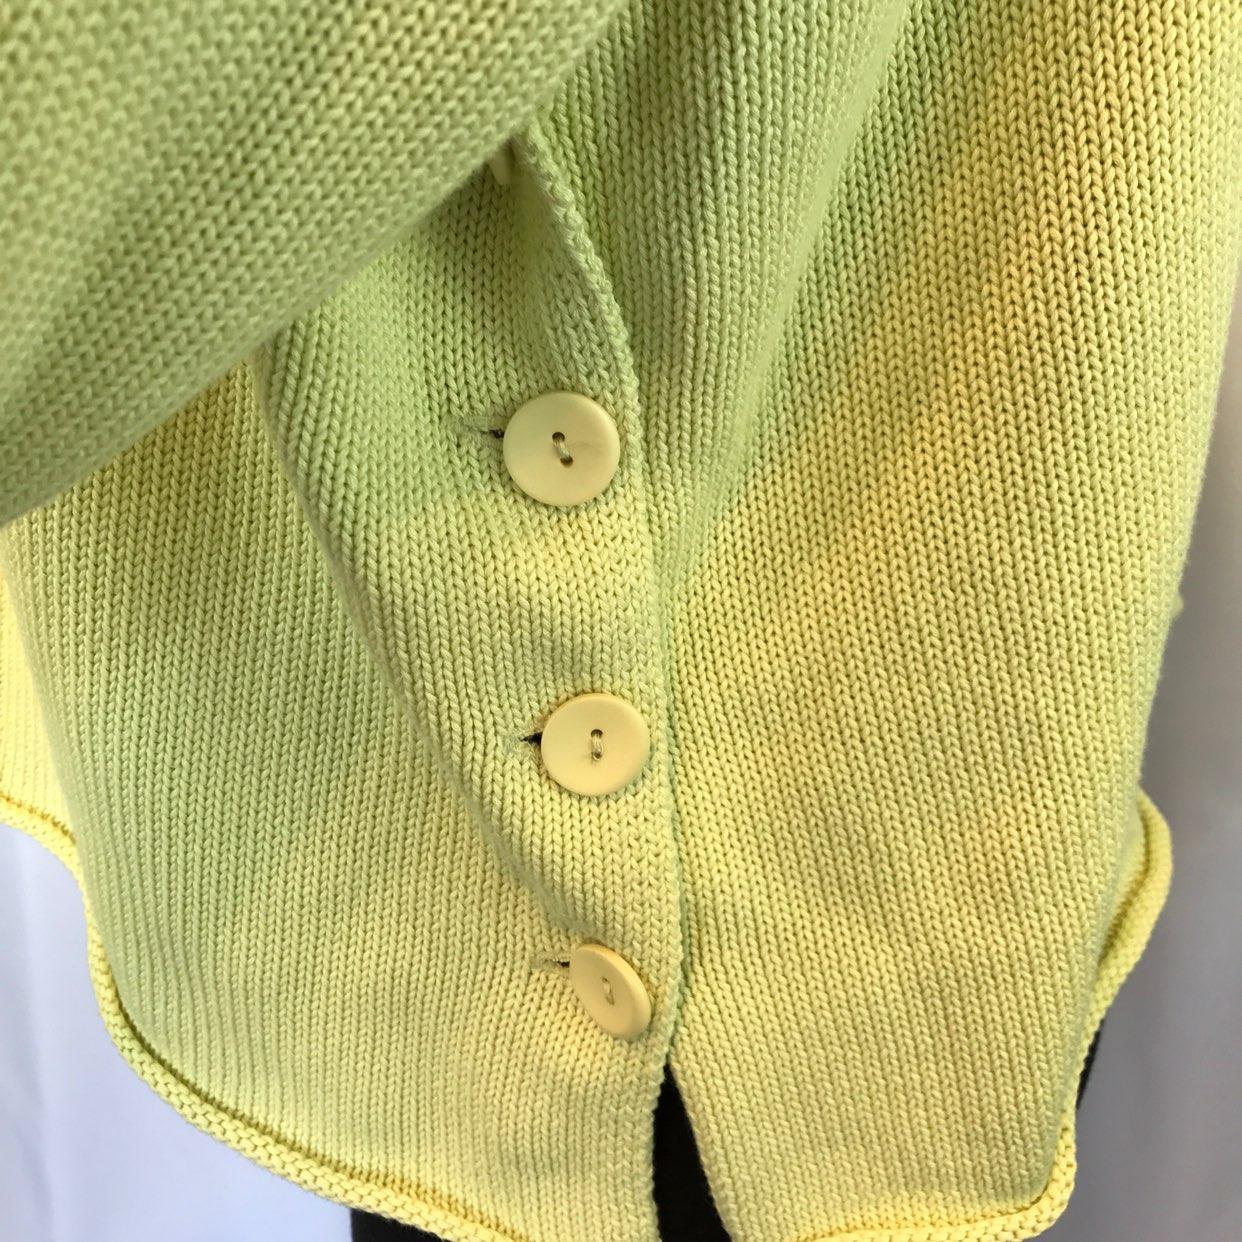 J Jill Pullover Yellow/Green Sweater Sm - Mercari: BUY & SELL ...